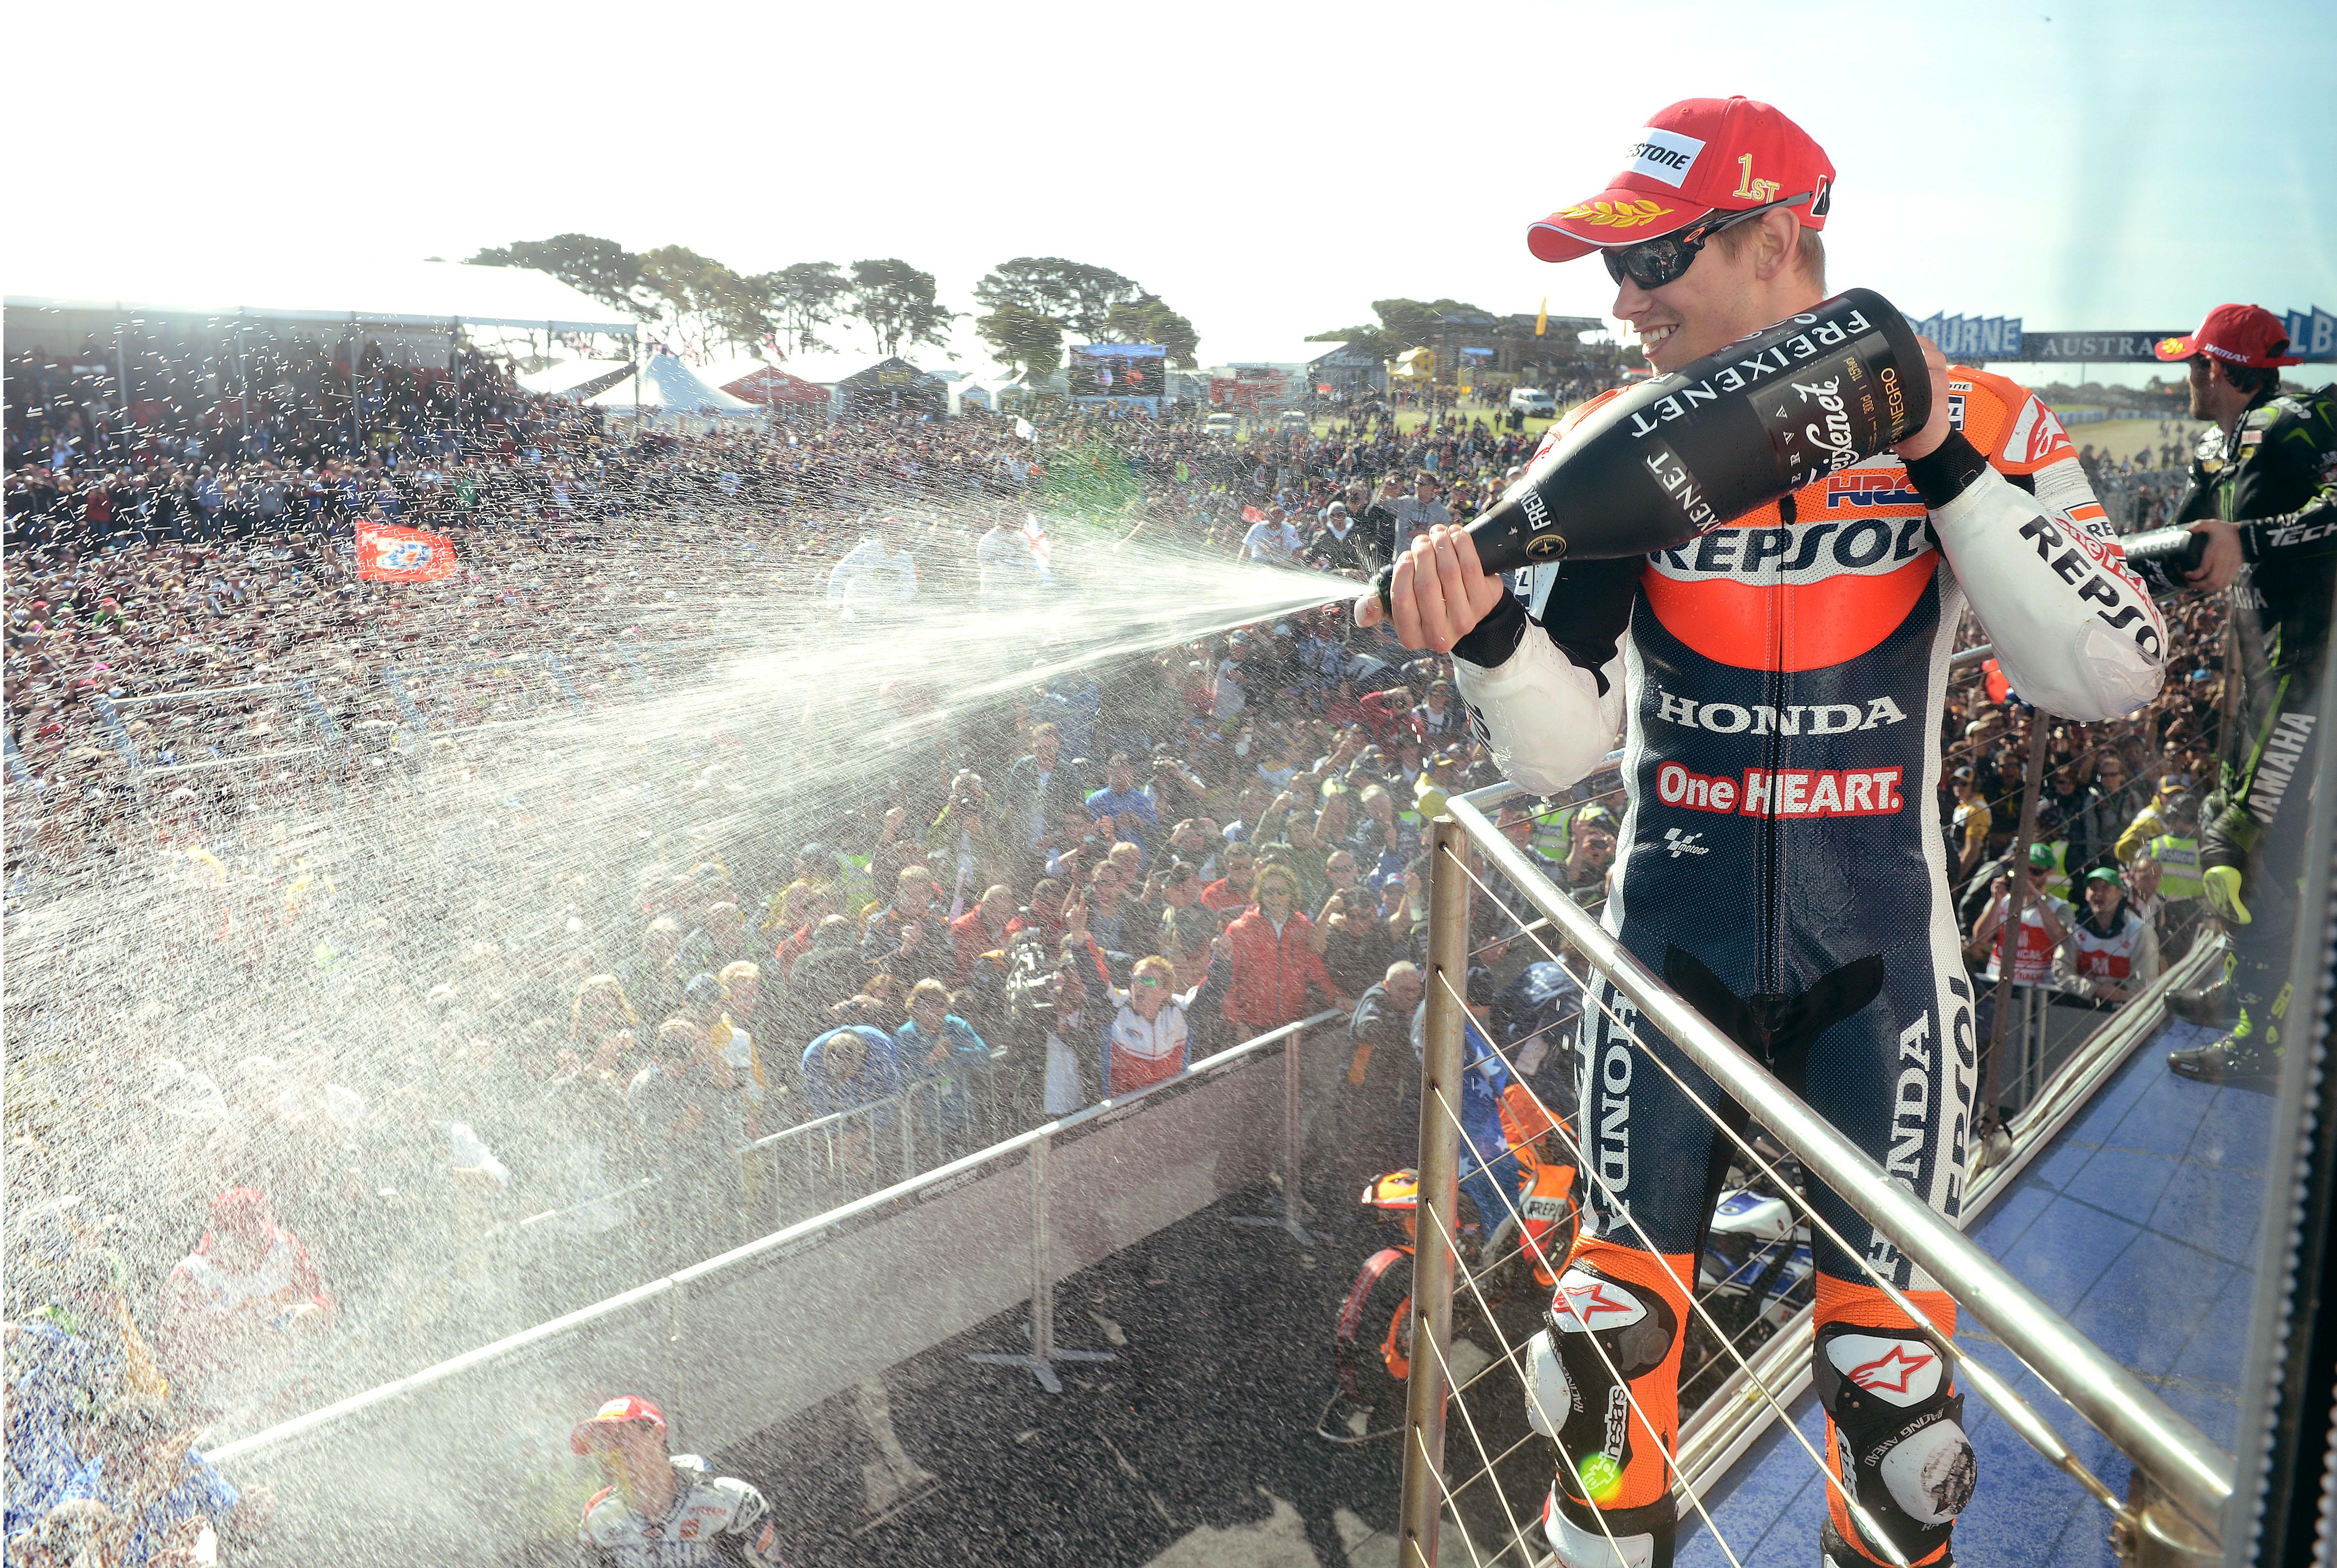 Casey Stoner, Repsol Honda, Australian MotoGP 2012,